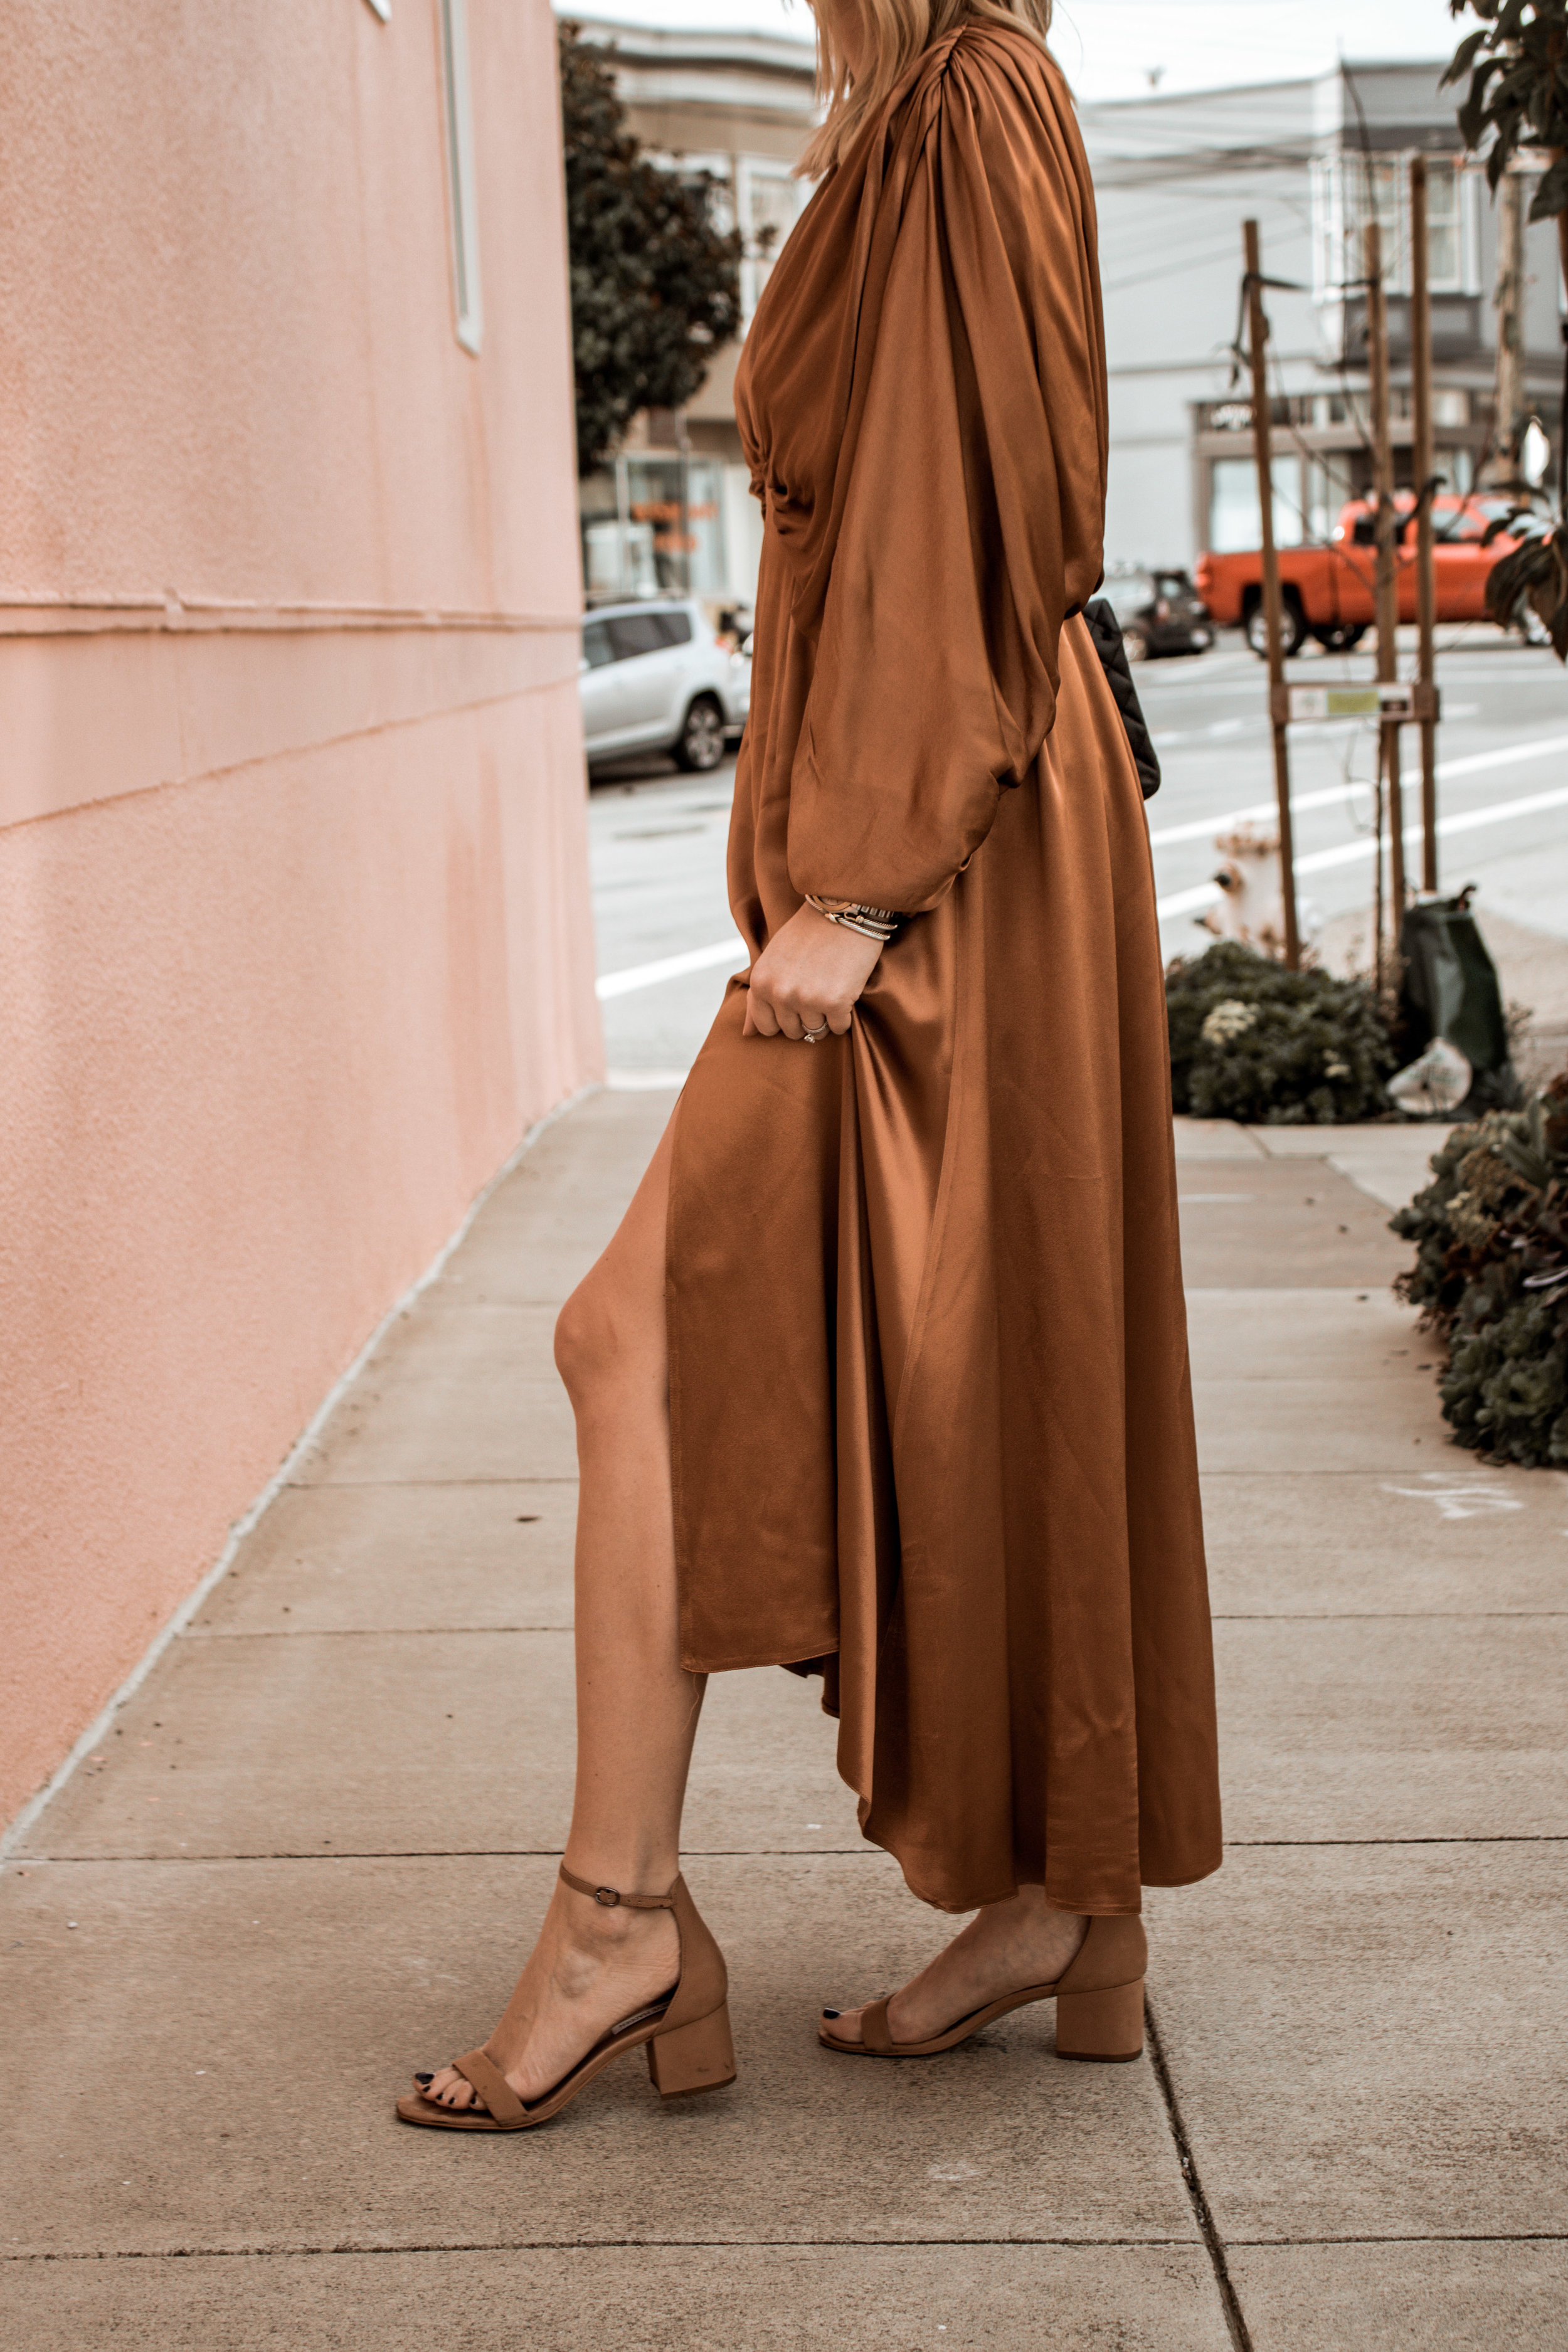 asos-rust-open-back-dress-1.jpg